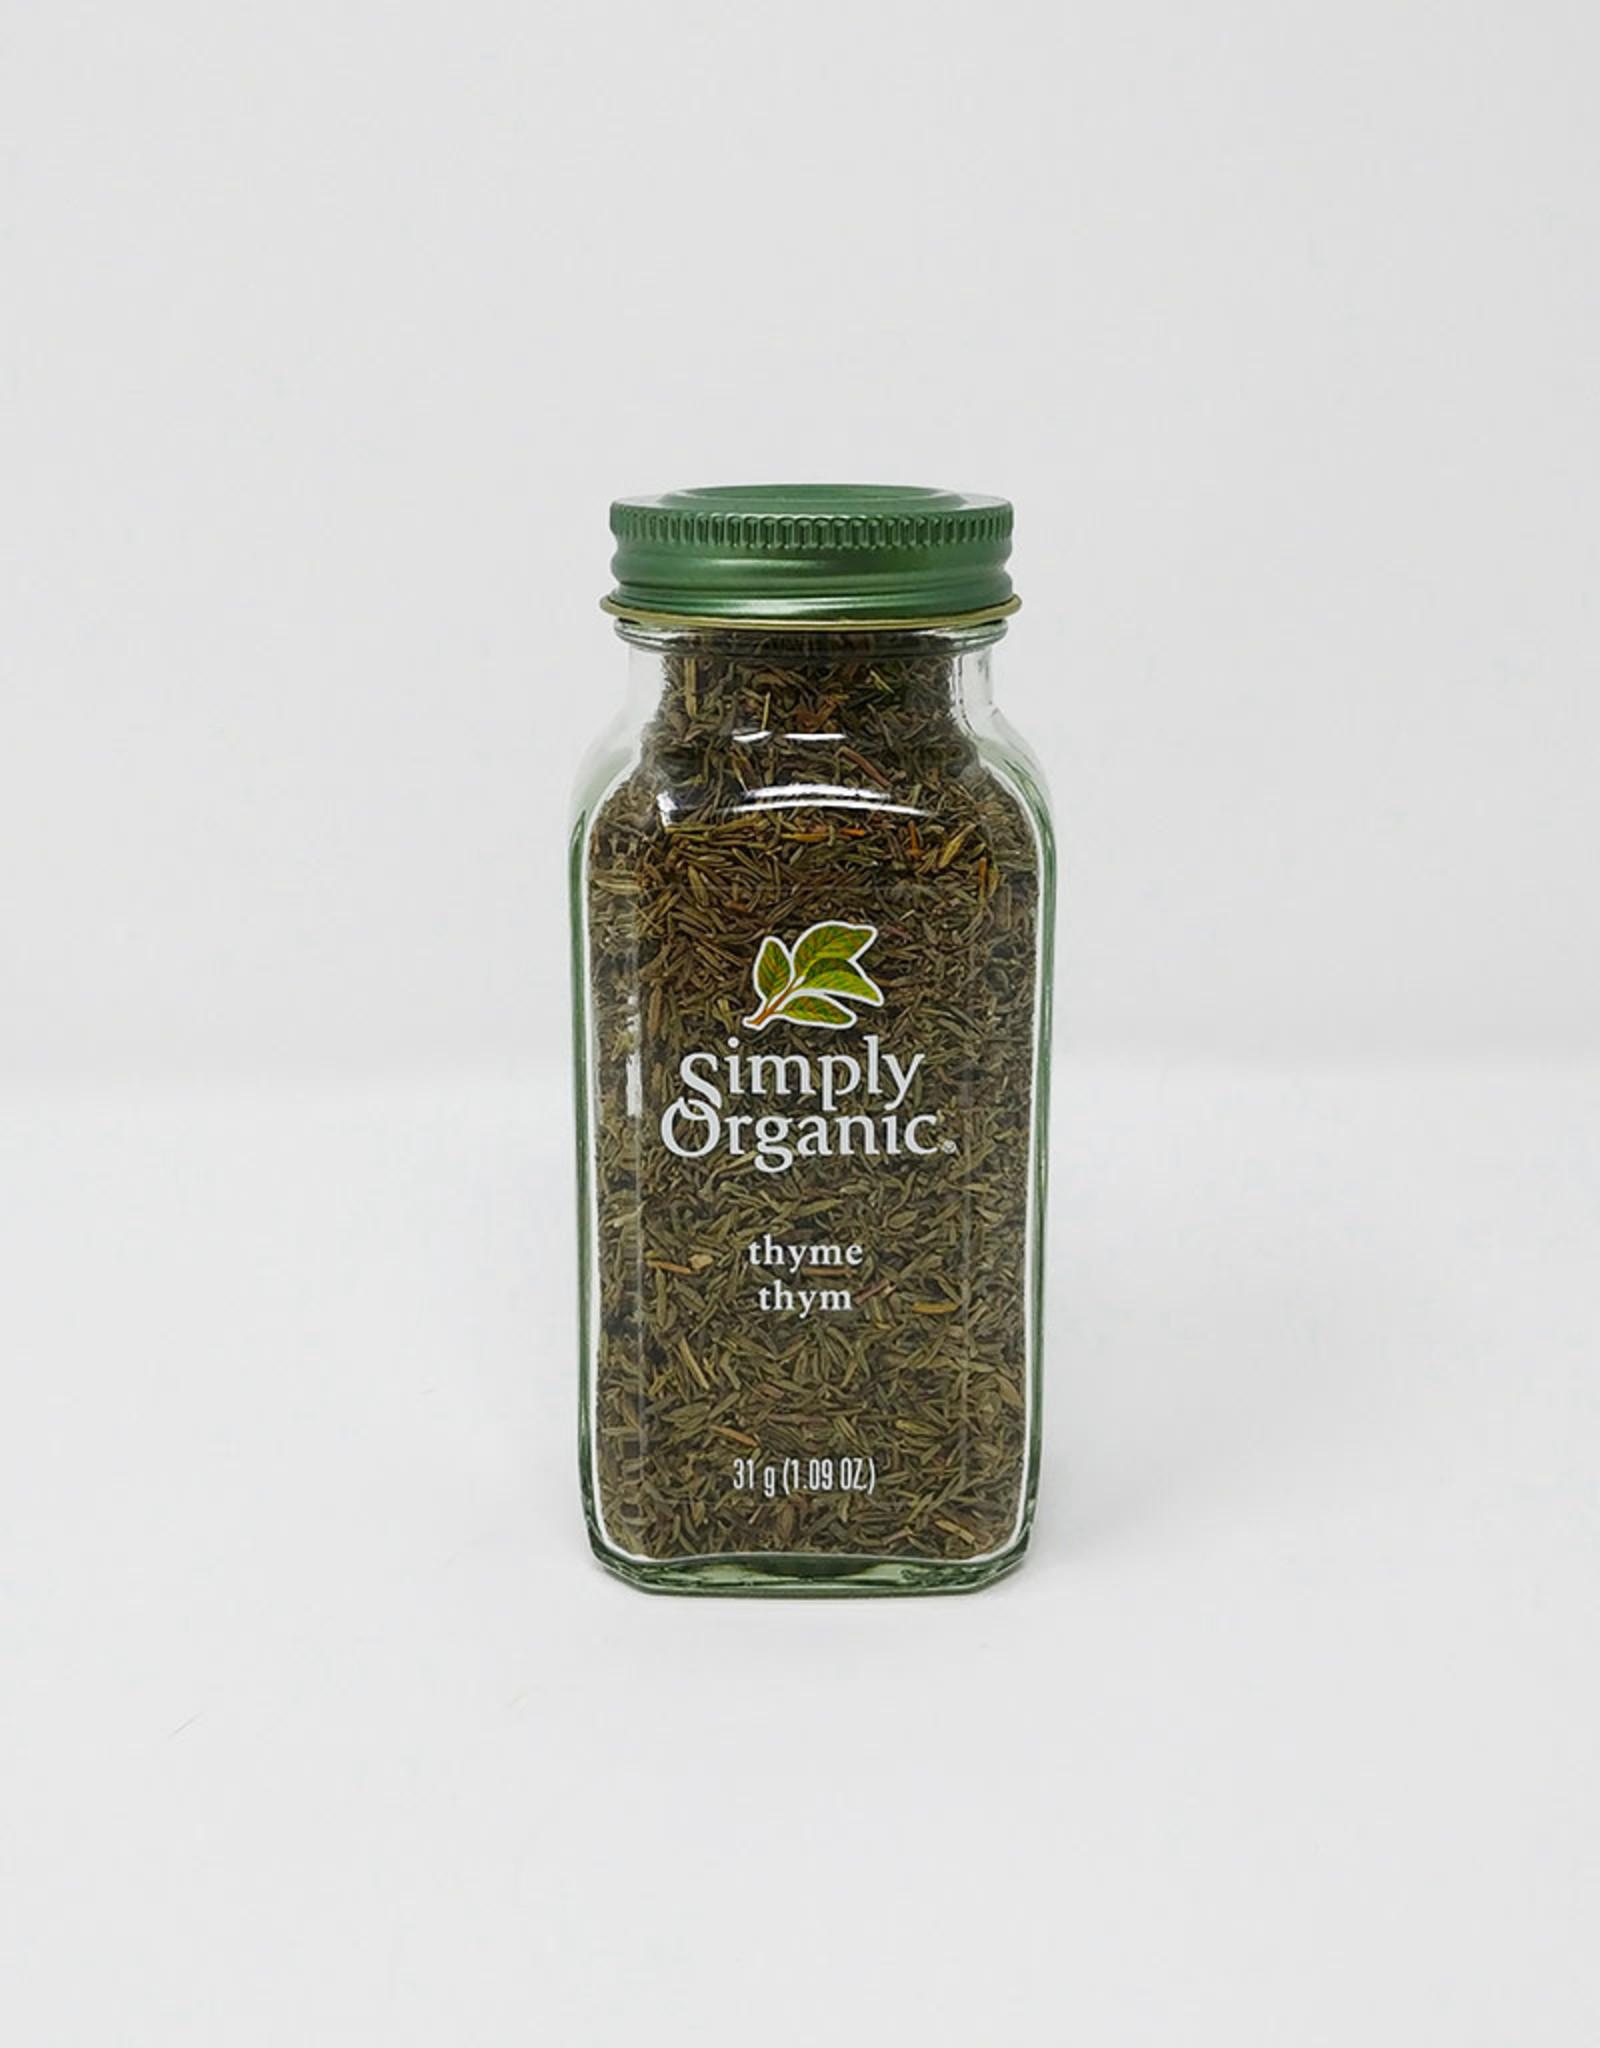 Simply Organic Simply Organic - Thyme